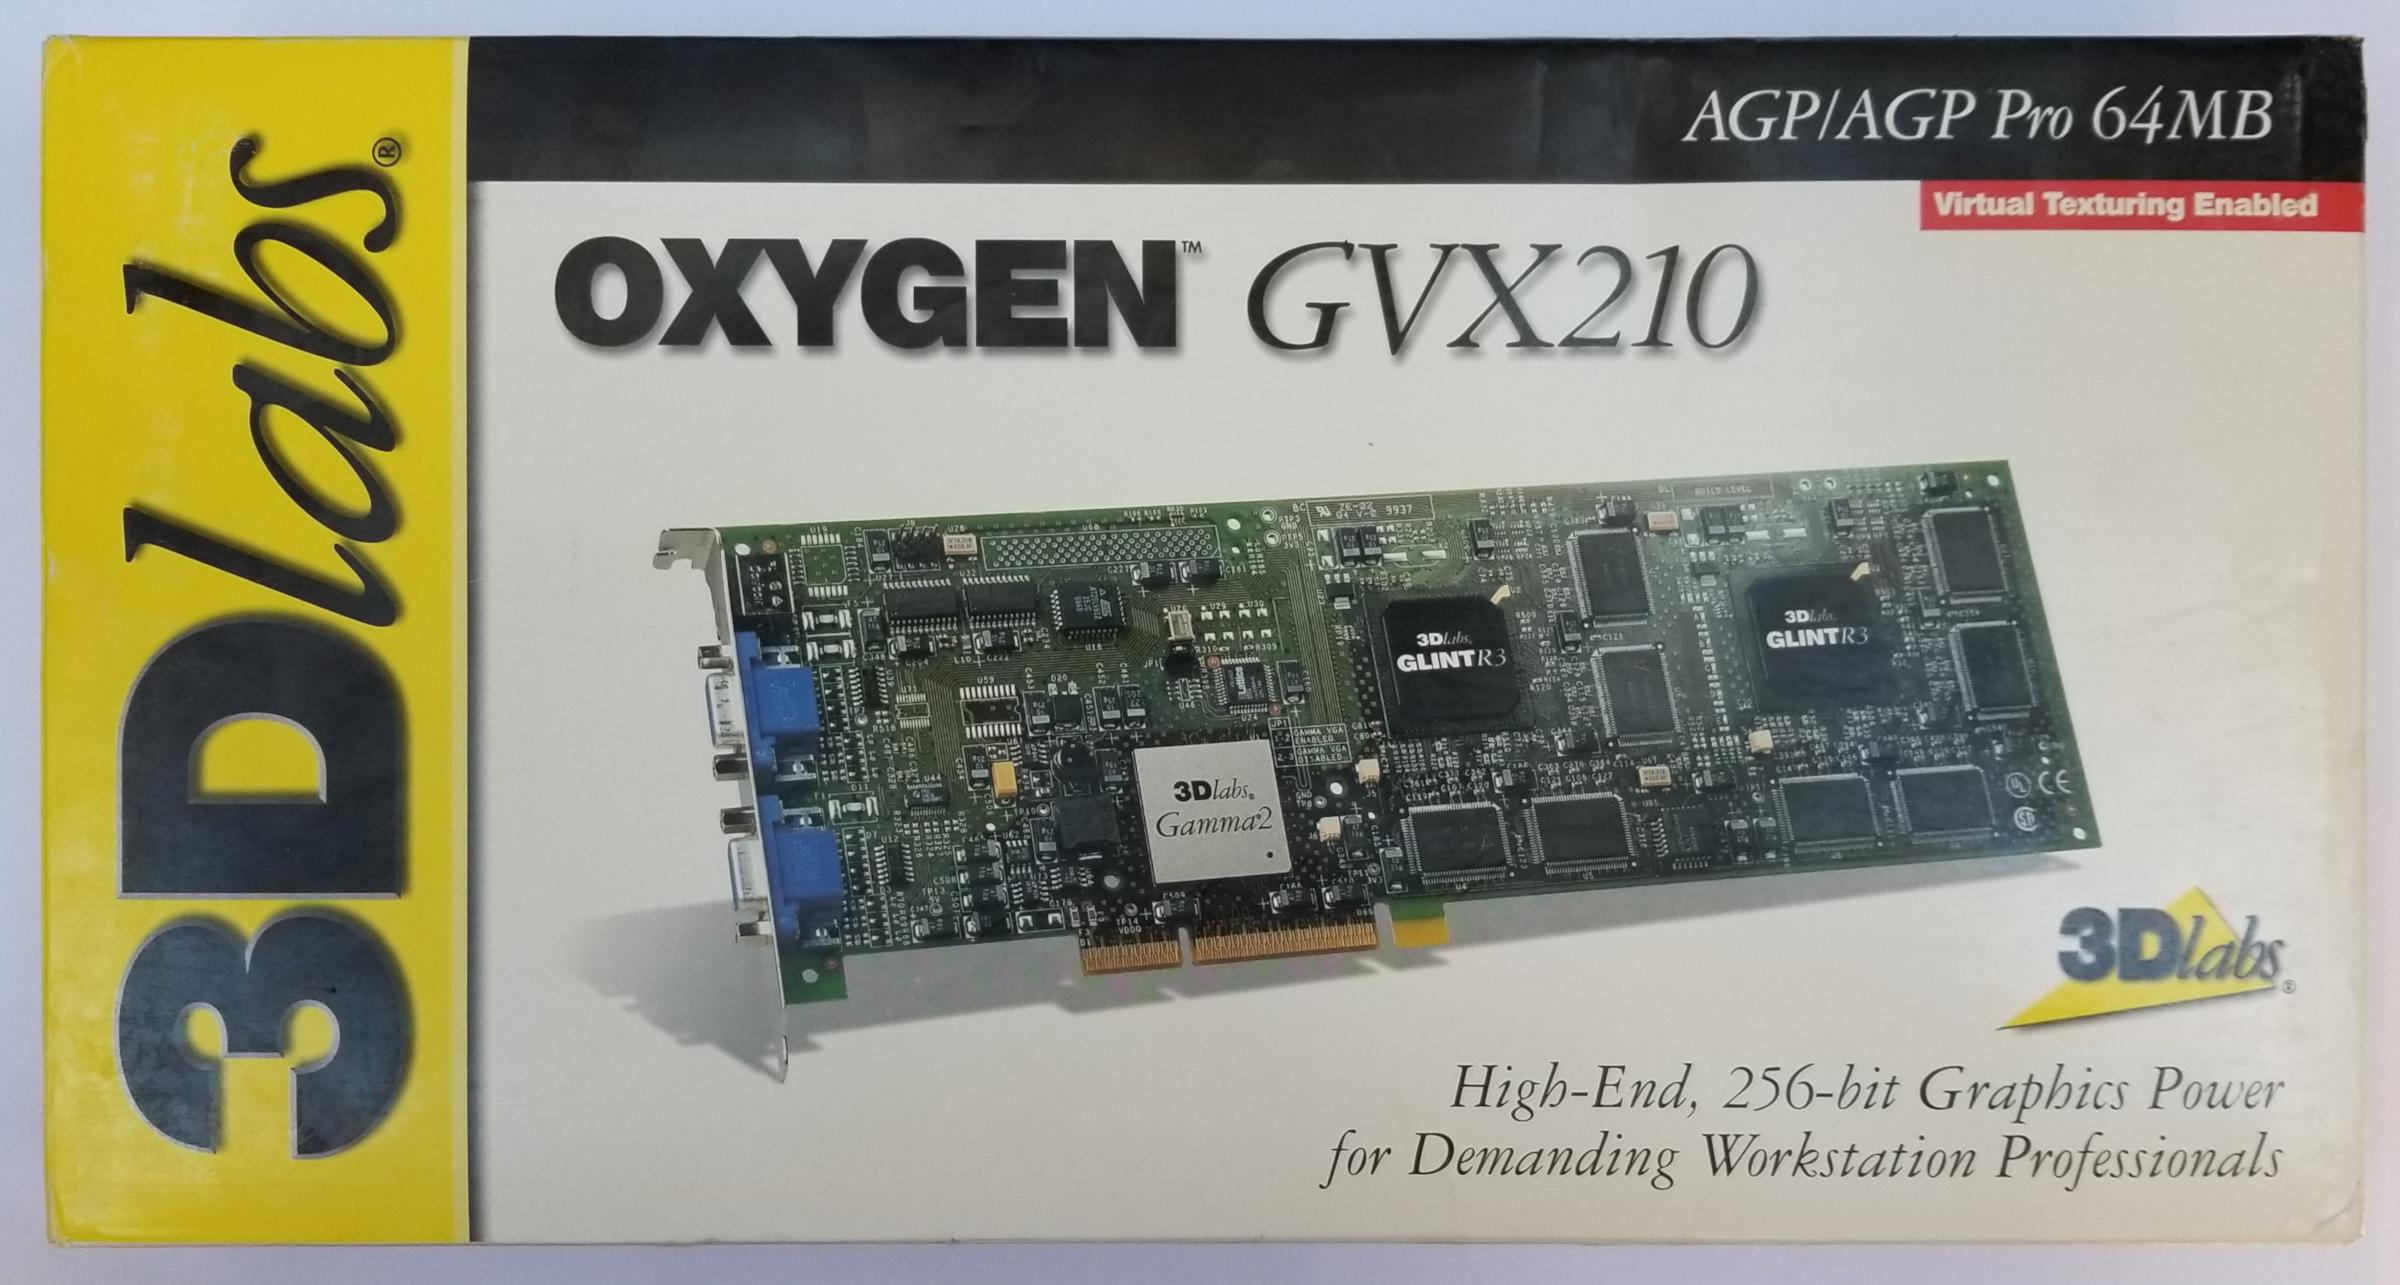 vga_agp_oxygen_gvx210_box.jpg